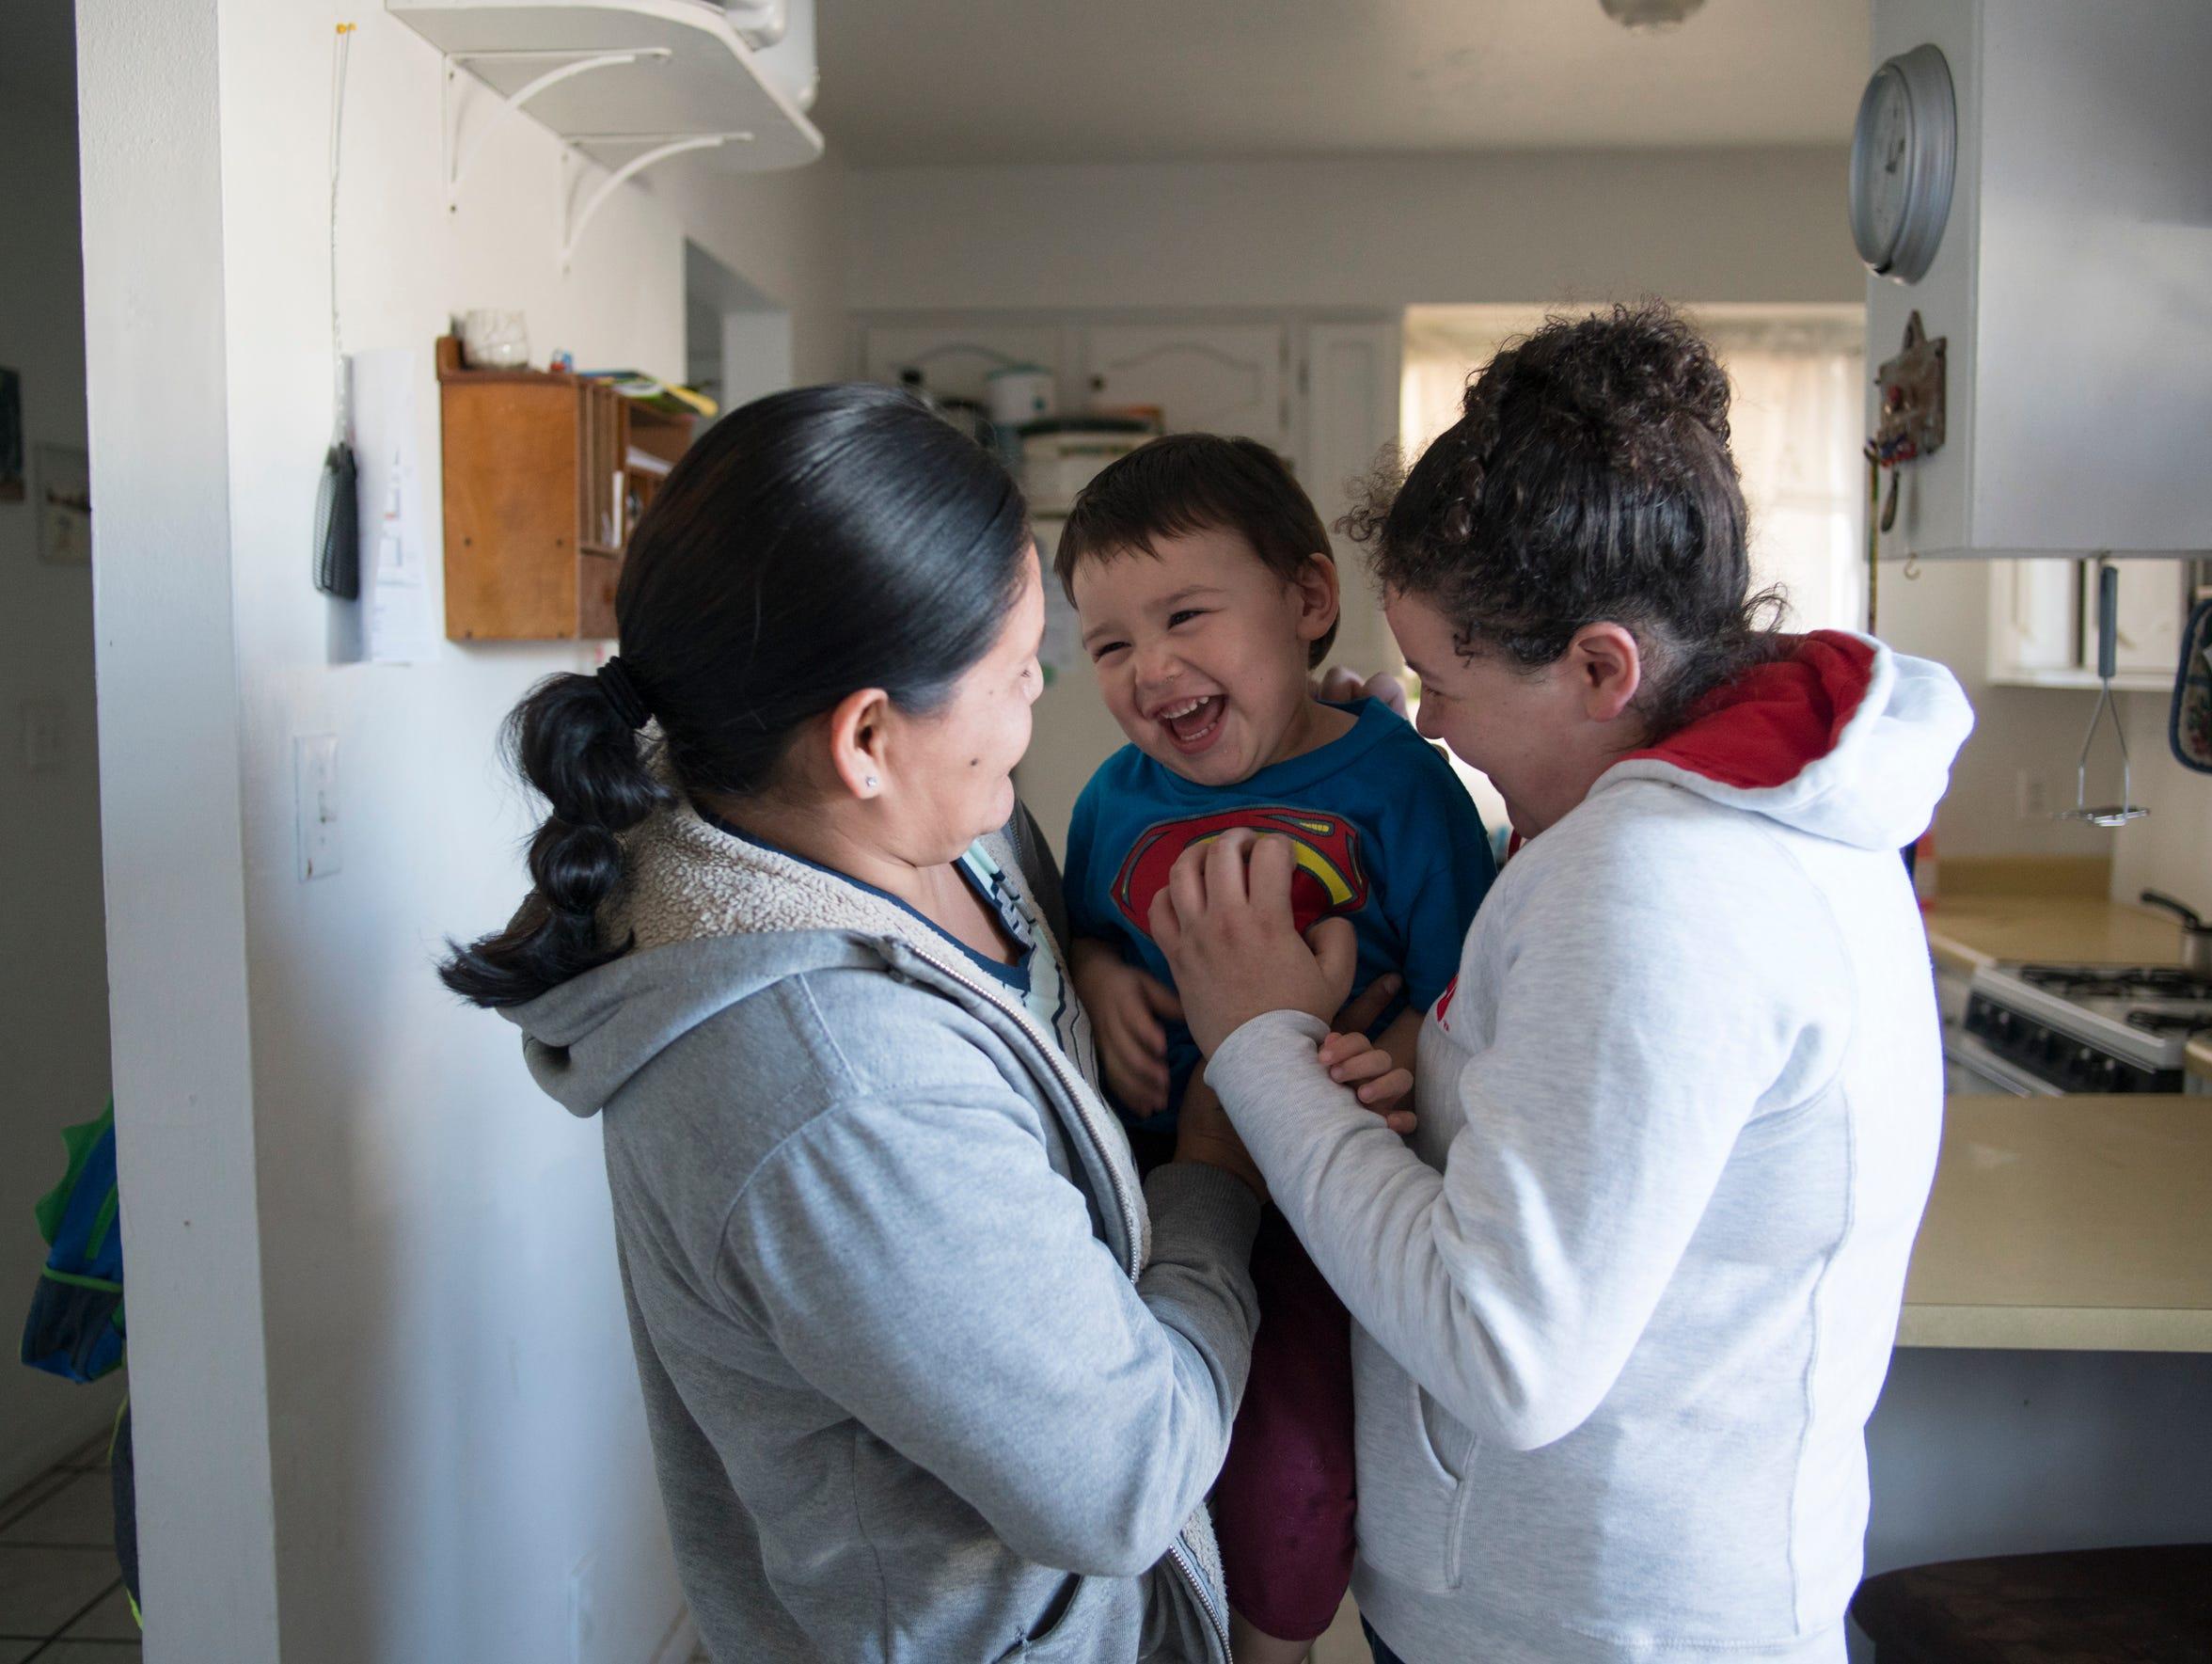 Rhonda Ramirez, her son Josiah Lucero and her boyfriend's